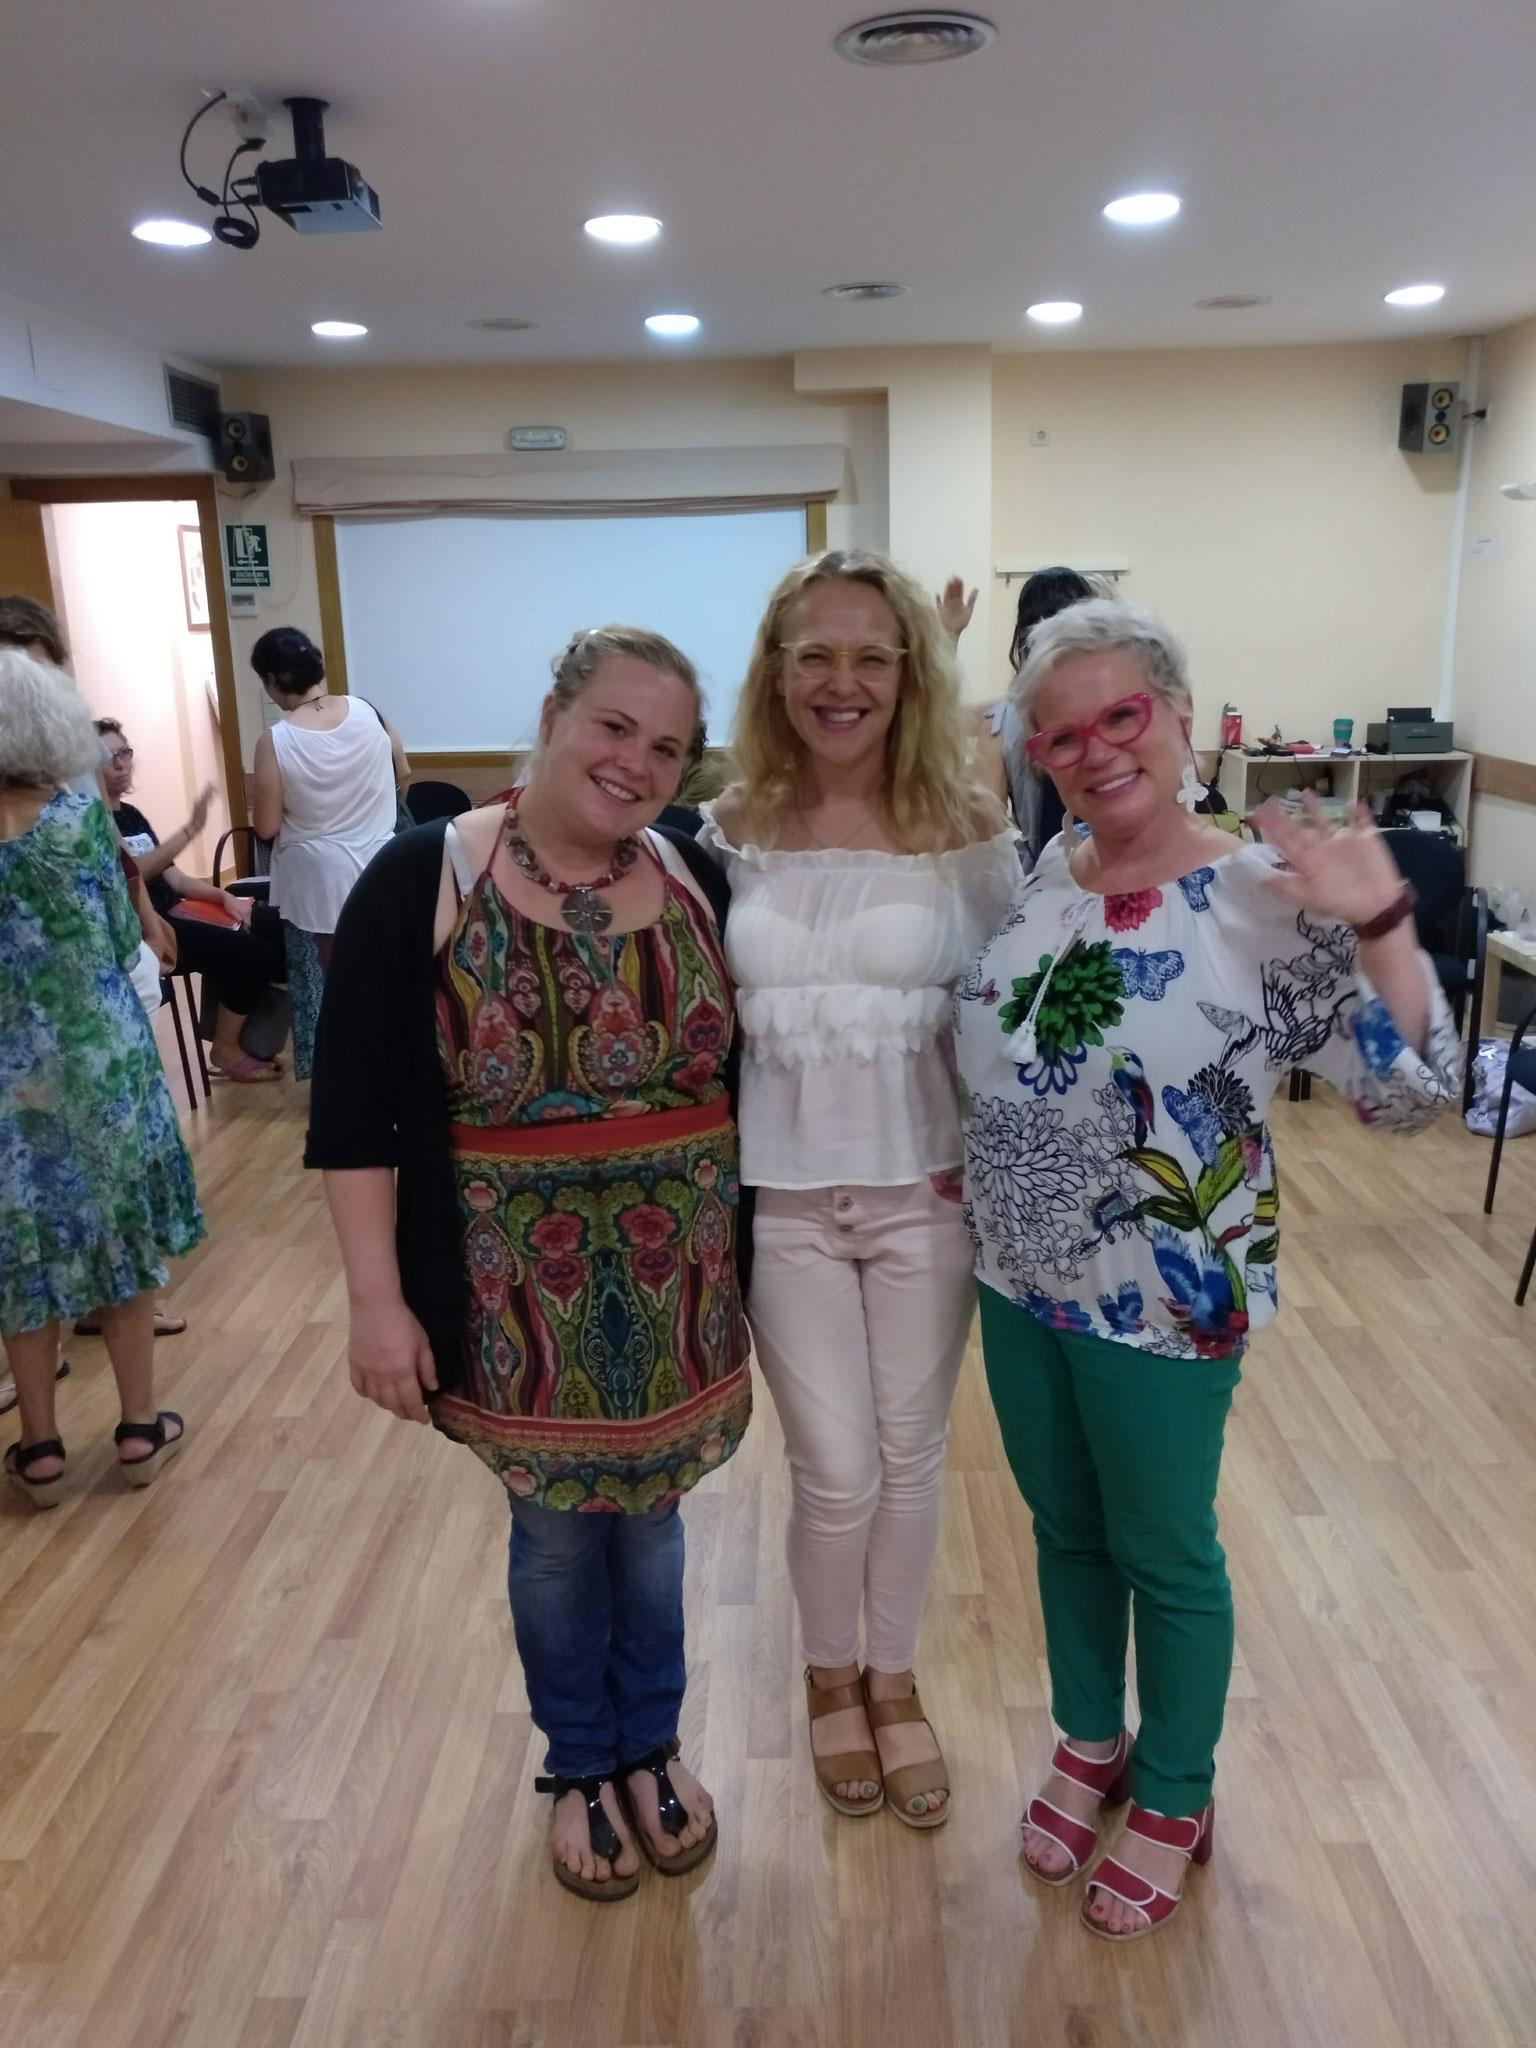 Jornada supervisión con Lola Siegmund y Cora Besser. Agosto'17